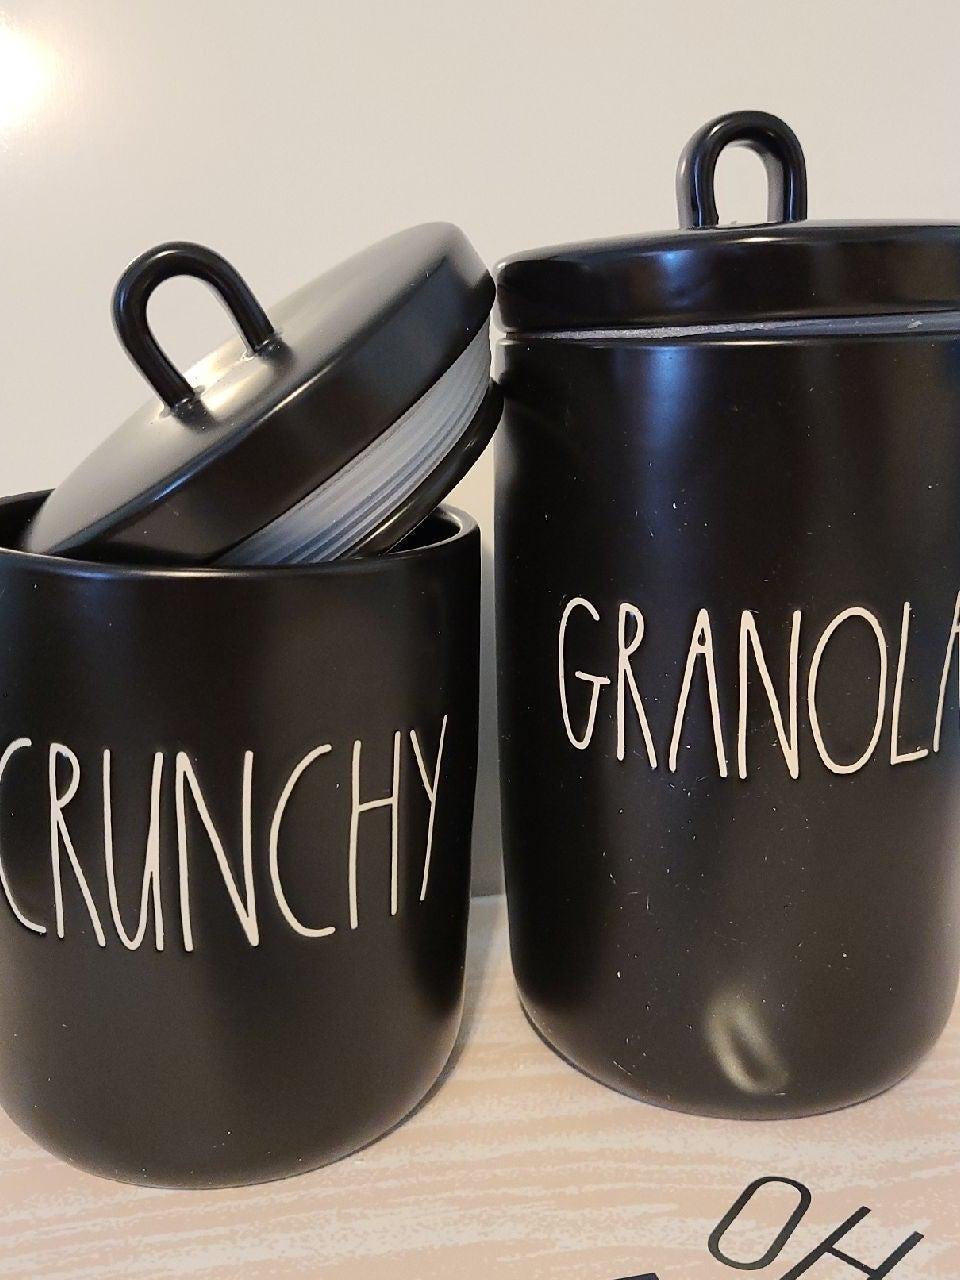 Rae Dunn Granola and crunchy Canister